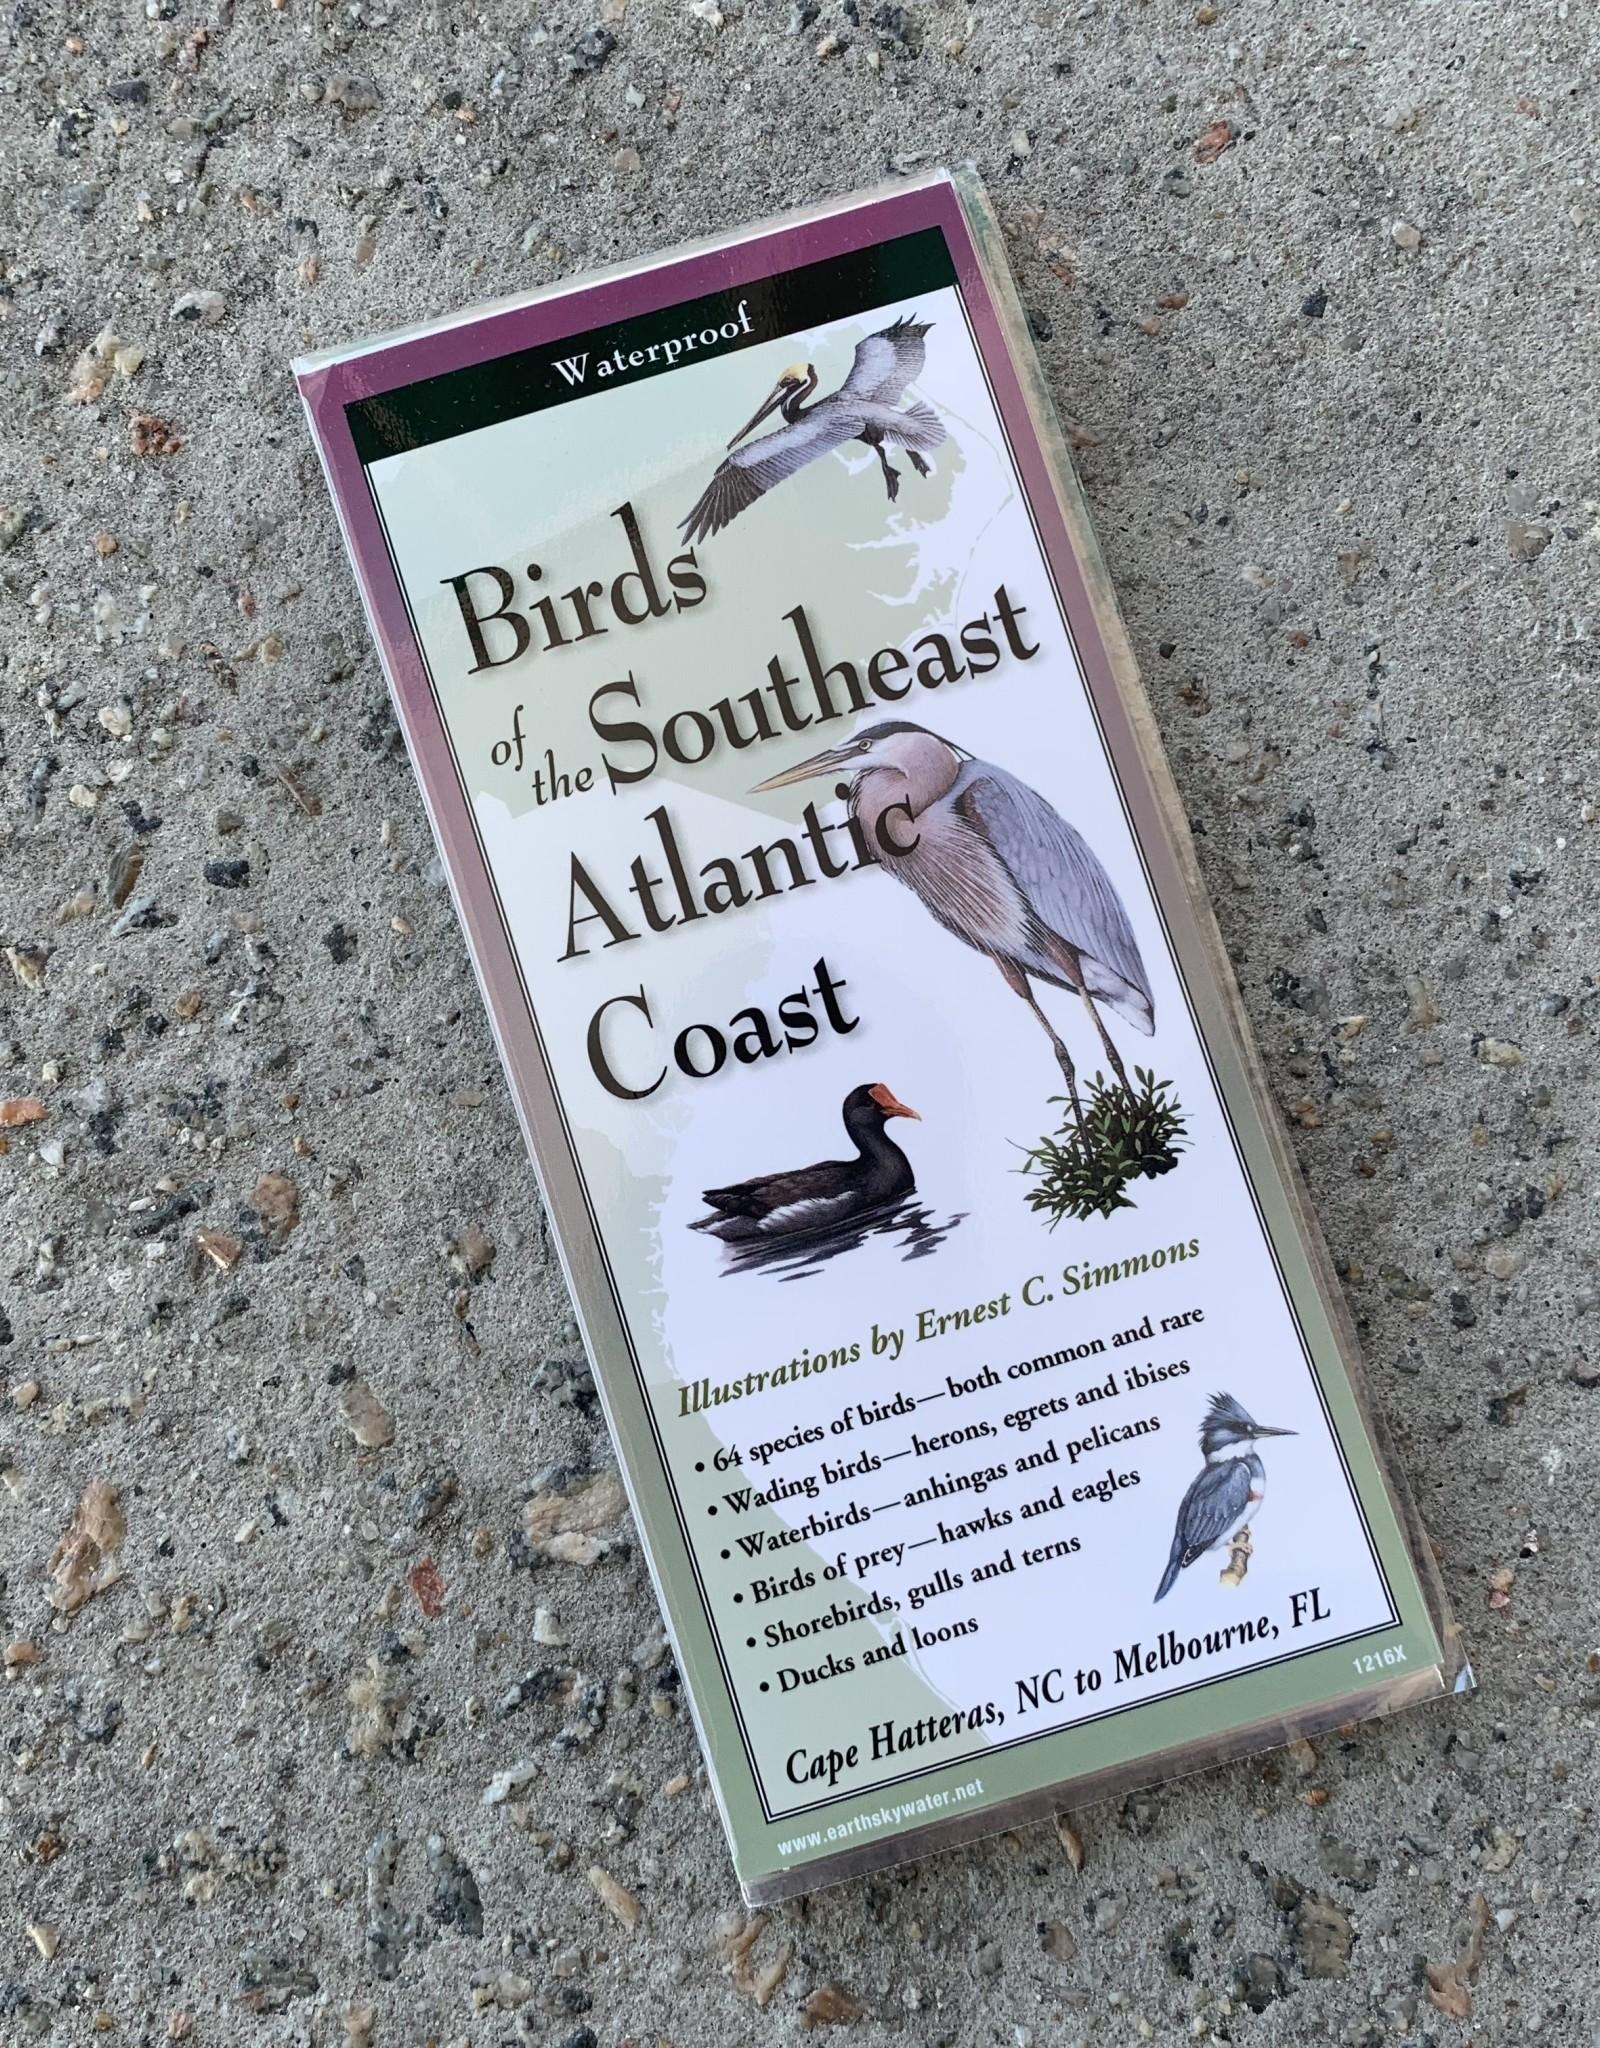 FOLDING GUIDE BIRDS OF SE ATLANTIC